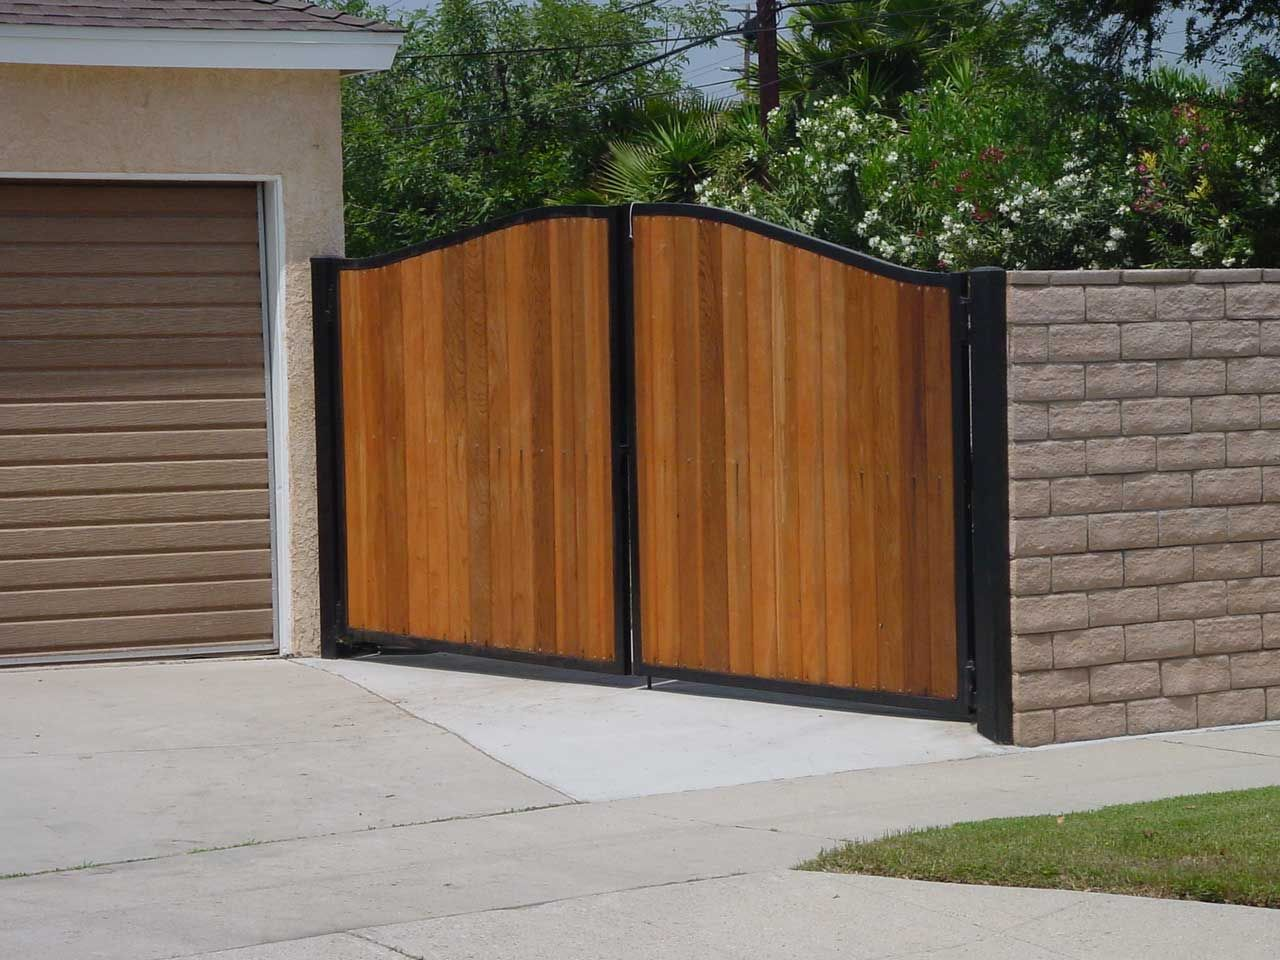 wooden fence gate design ideas best house design ideas - Fence Gate Design Ideas